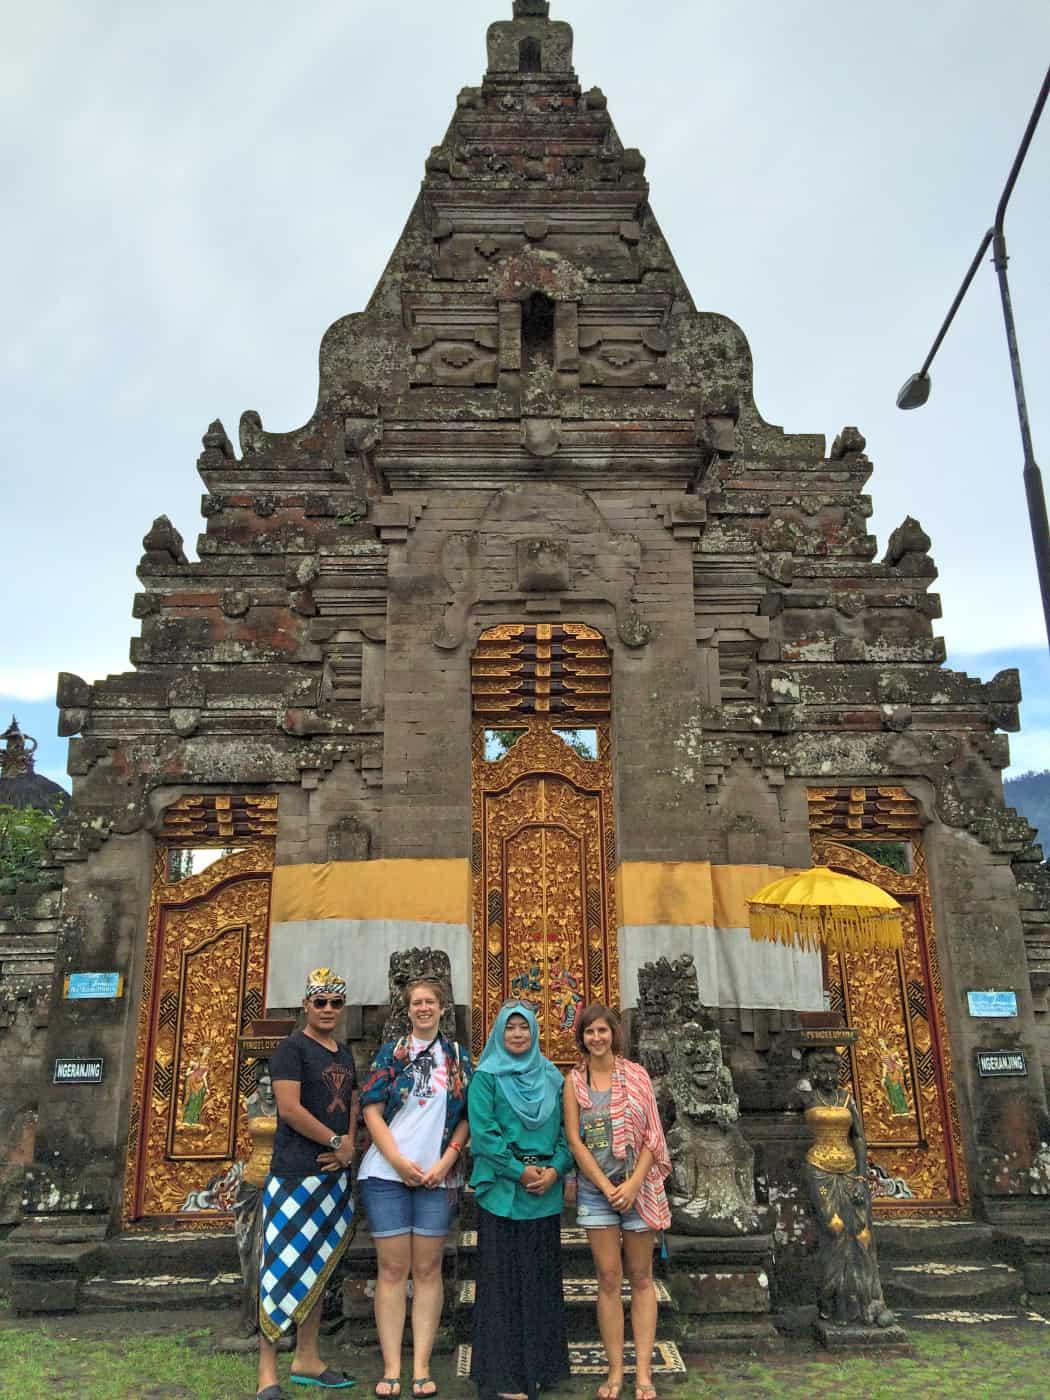 gogirlrun_bali_indonesien_privatetour_norden_4